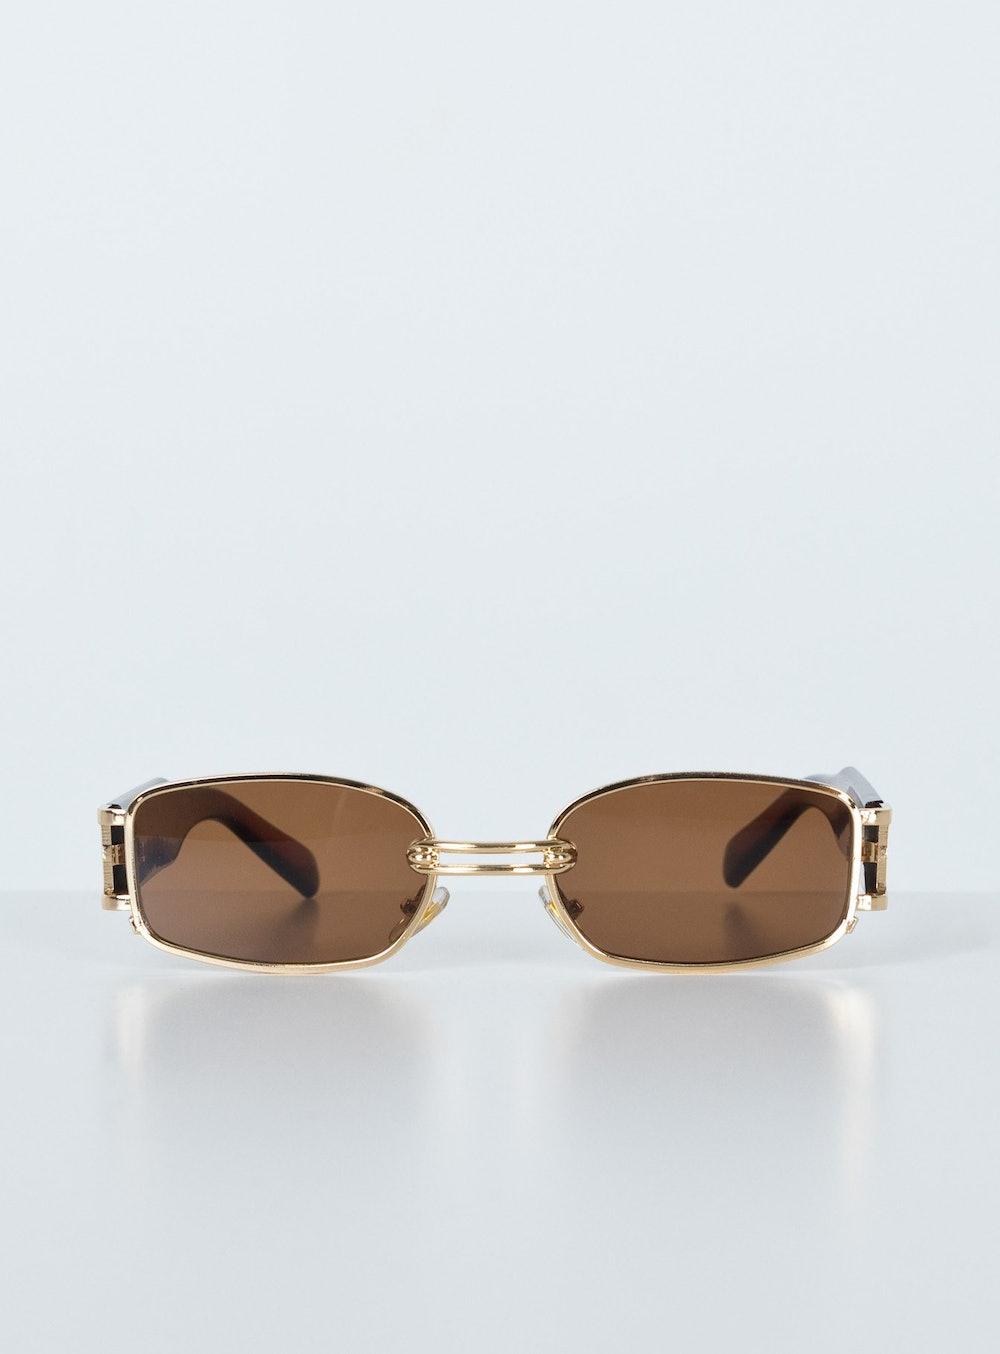 Yasmine Sunglasses in Brown